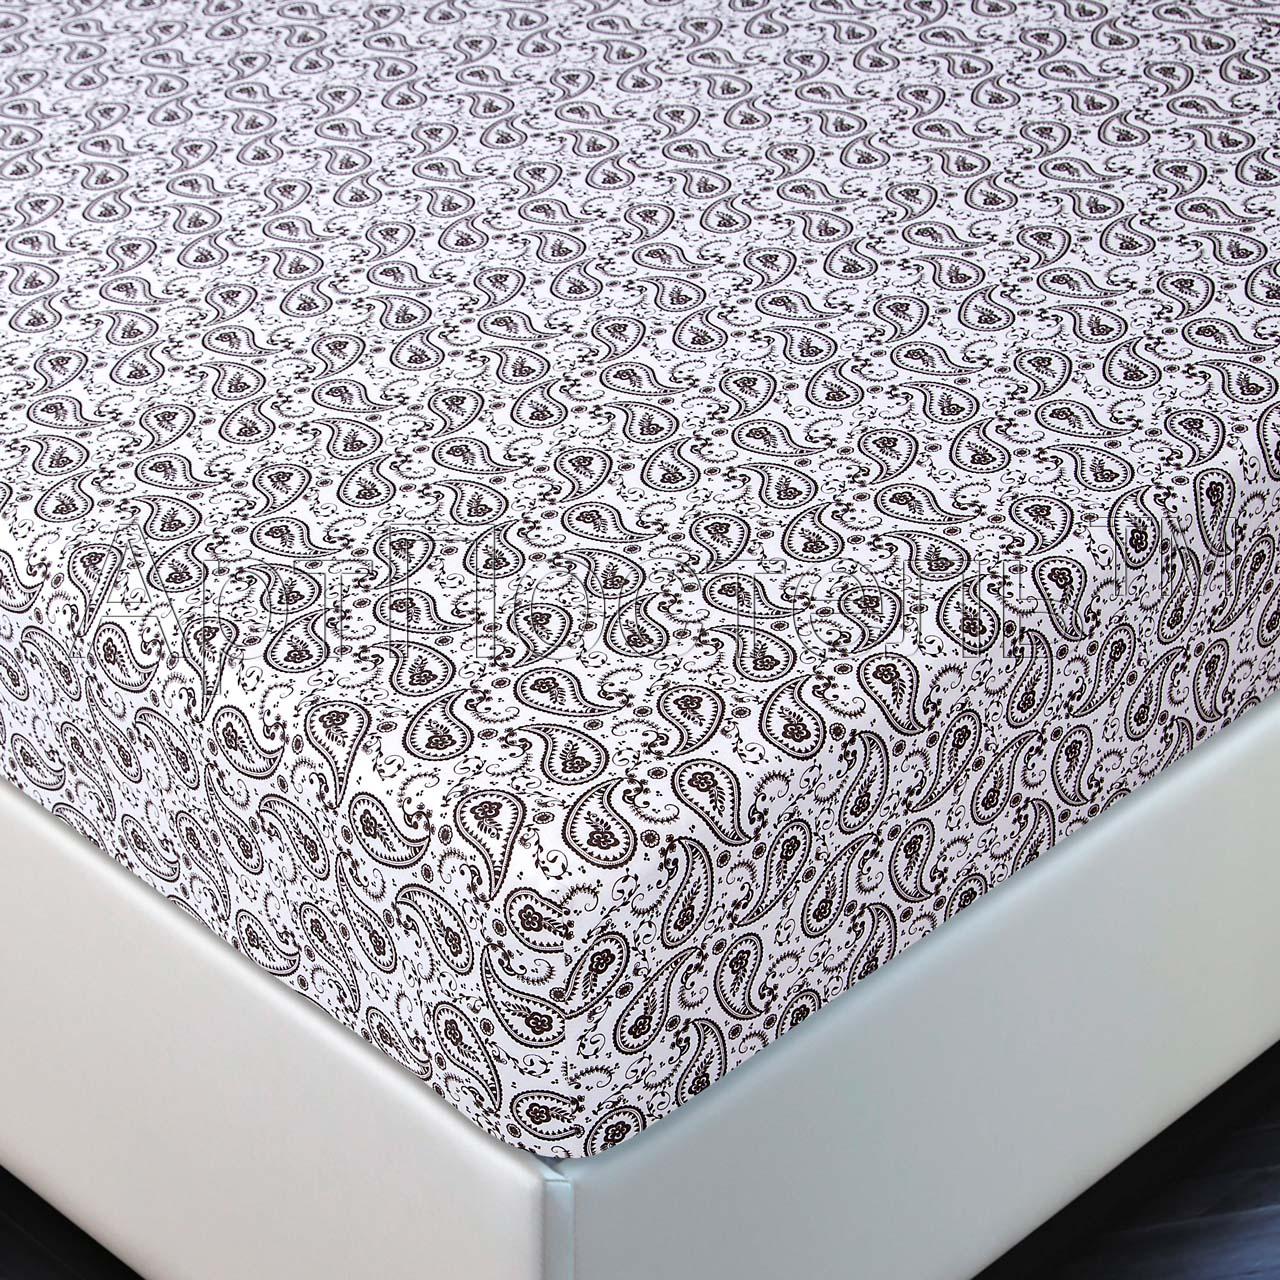 Простыня на резинке Ажур р. 140х200Простыни<br>Плотность ткани:140 г/кв. м<br><br>Тип: Простыня на резинке<br>Размер: 140х200<br>Материал: Кулирка